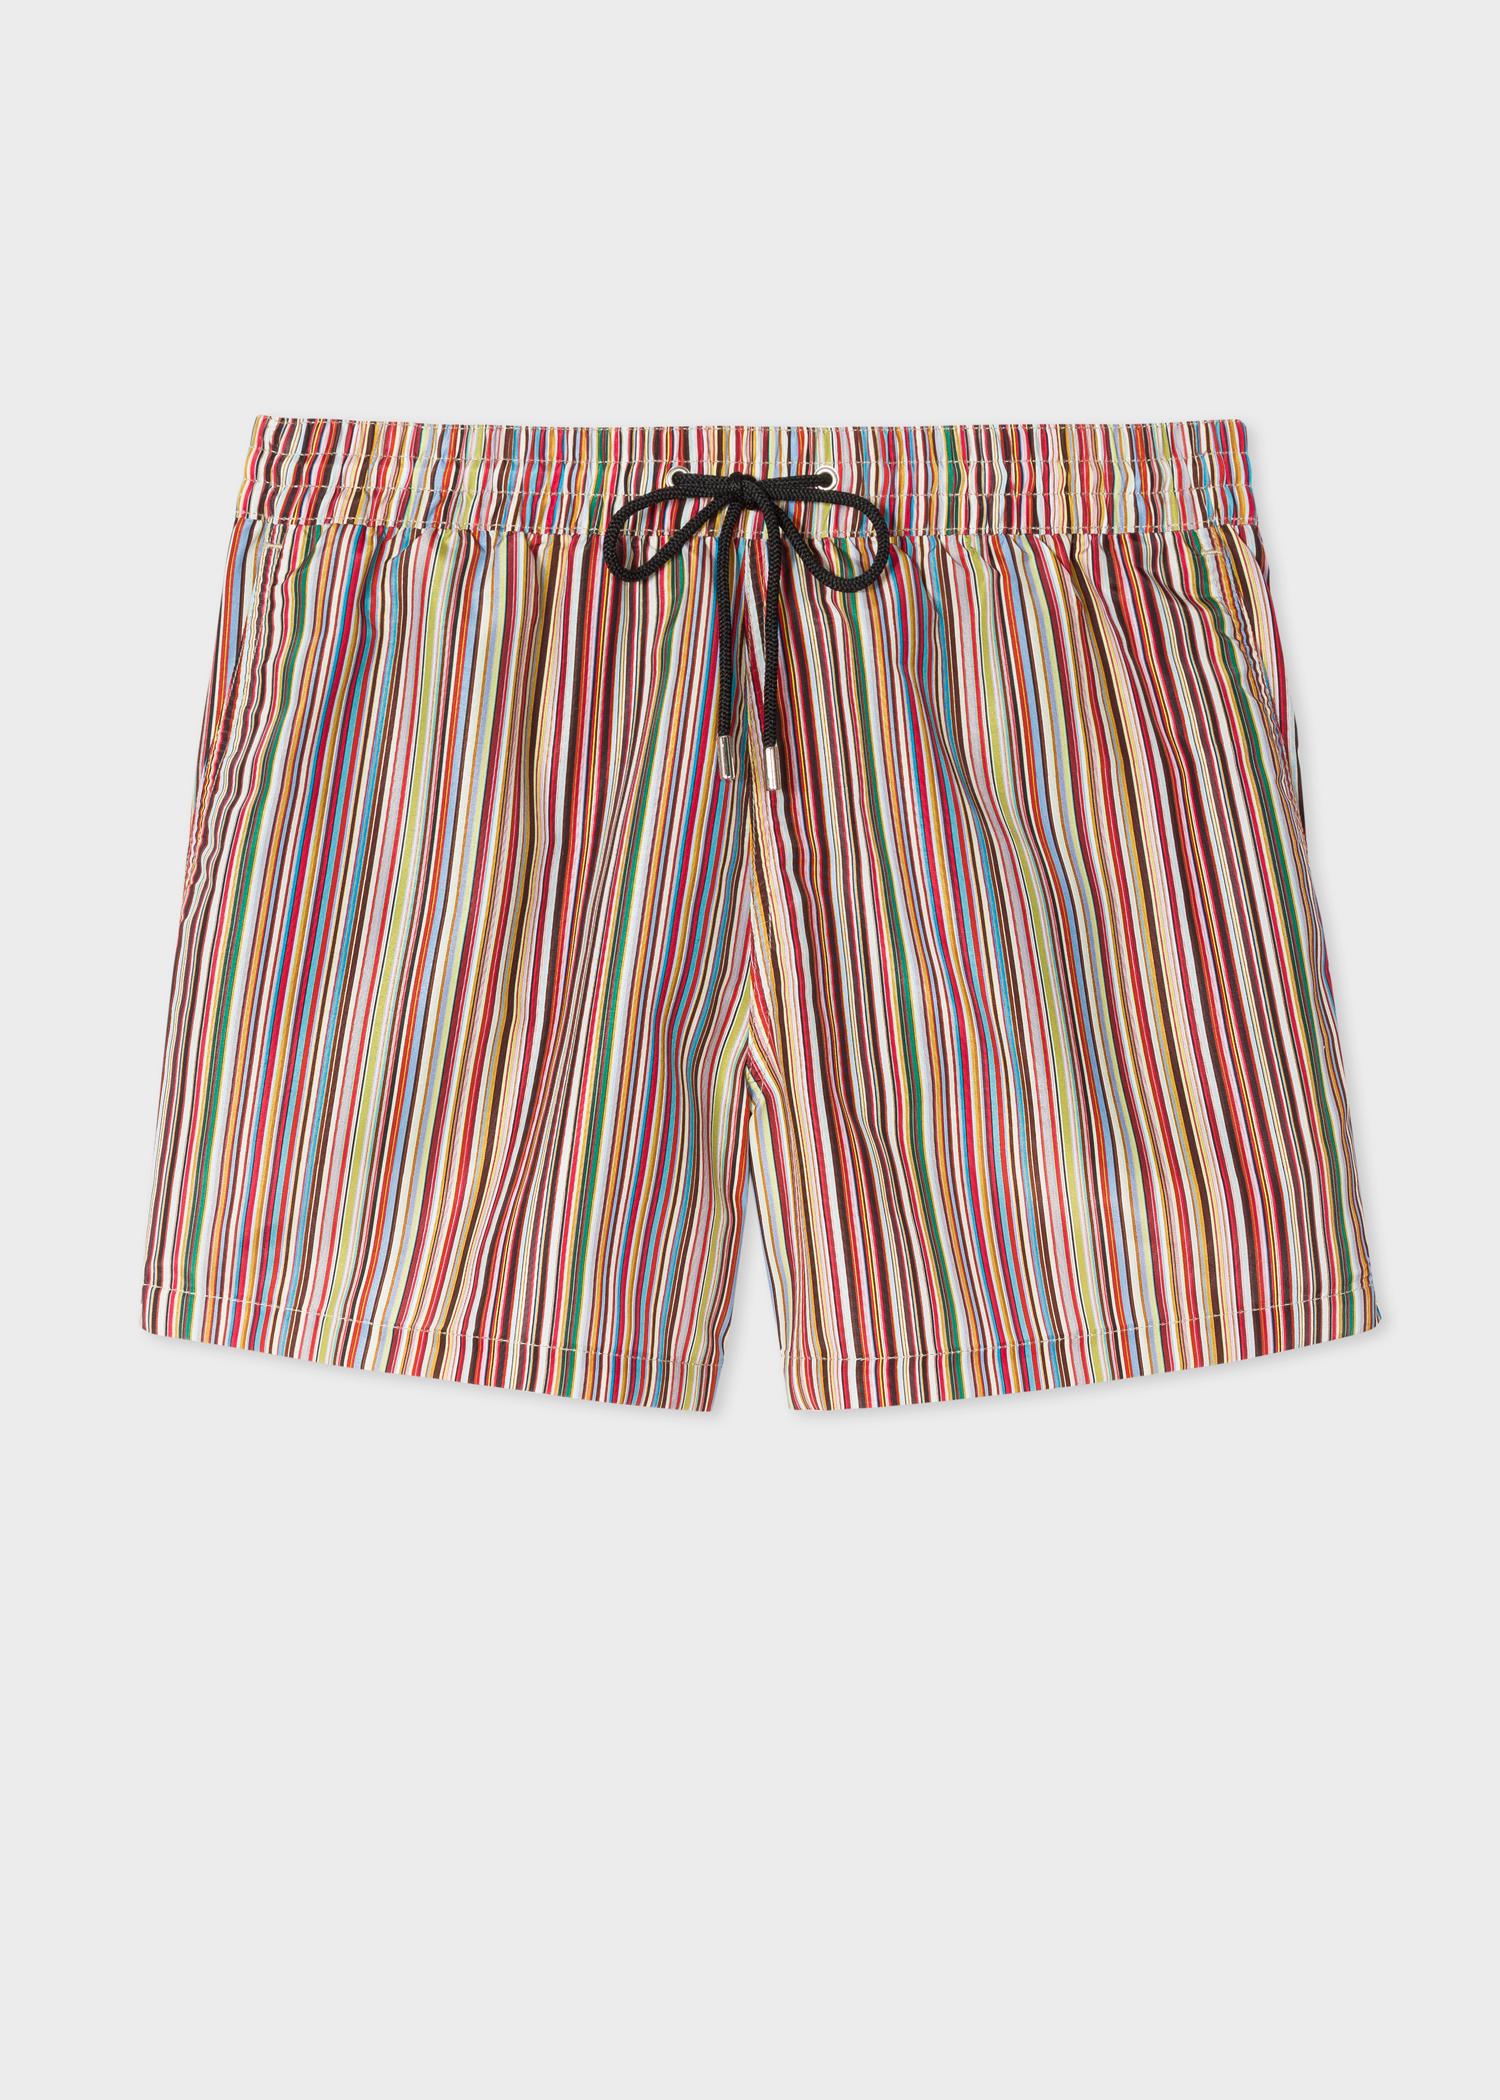 e46a6b124b Men's 'Signature Stripe' print swim shorts by Paul Smith